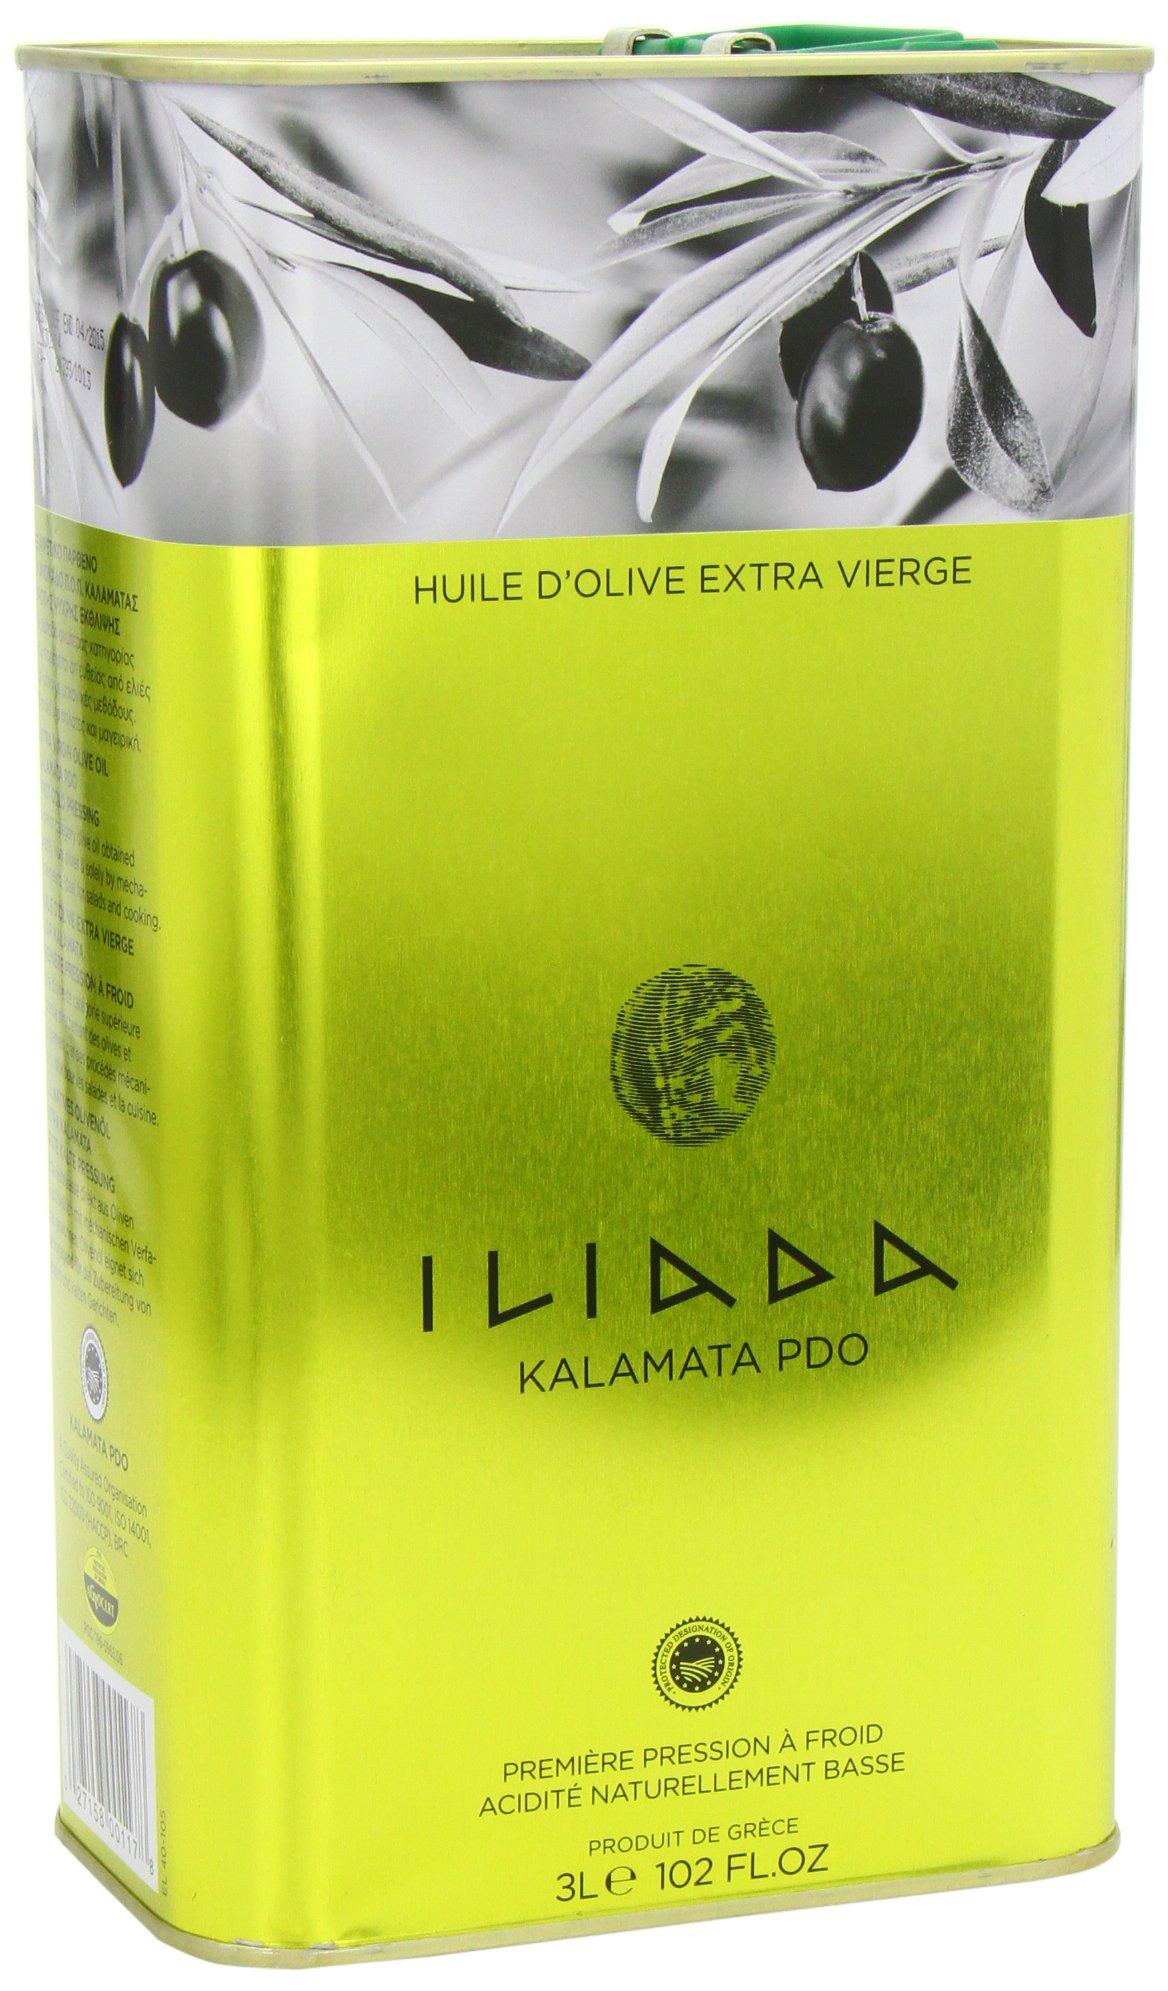 Iliada Extra Virgin Olive Oil Tin, 3 Liter by Iliada (Image #6)